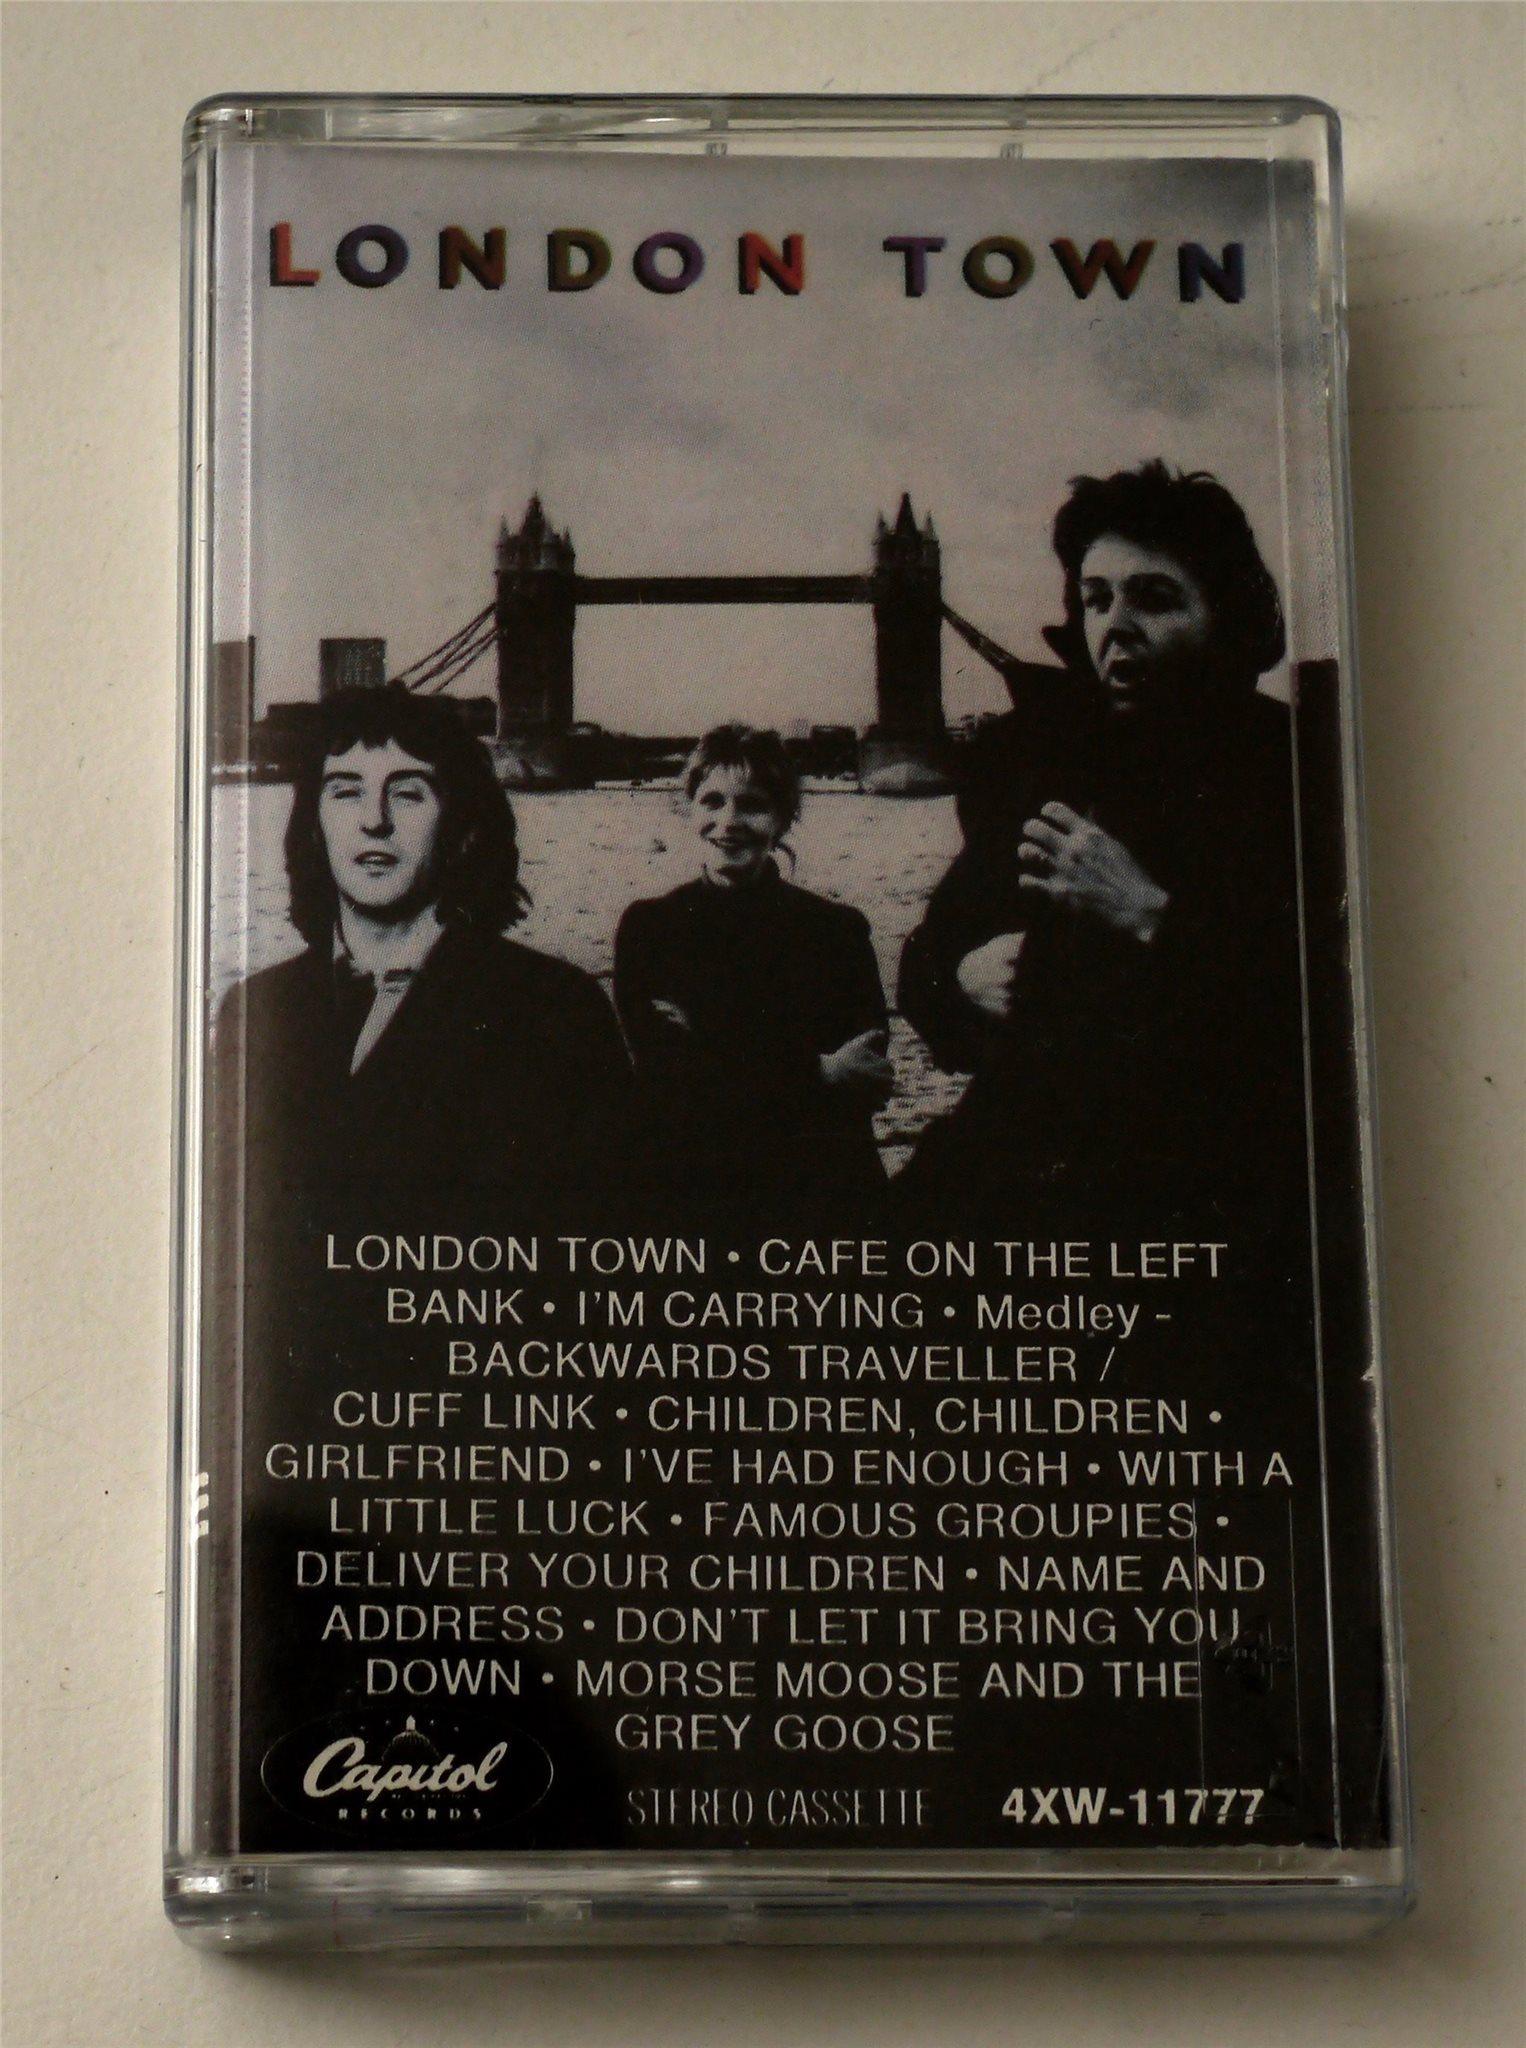 Wings - Paul McCartney / London Town kassettban   (344488685) ᐈ Köp